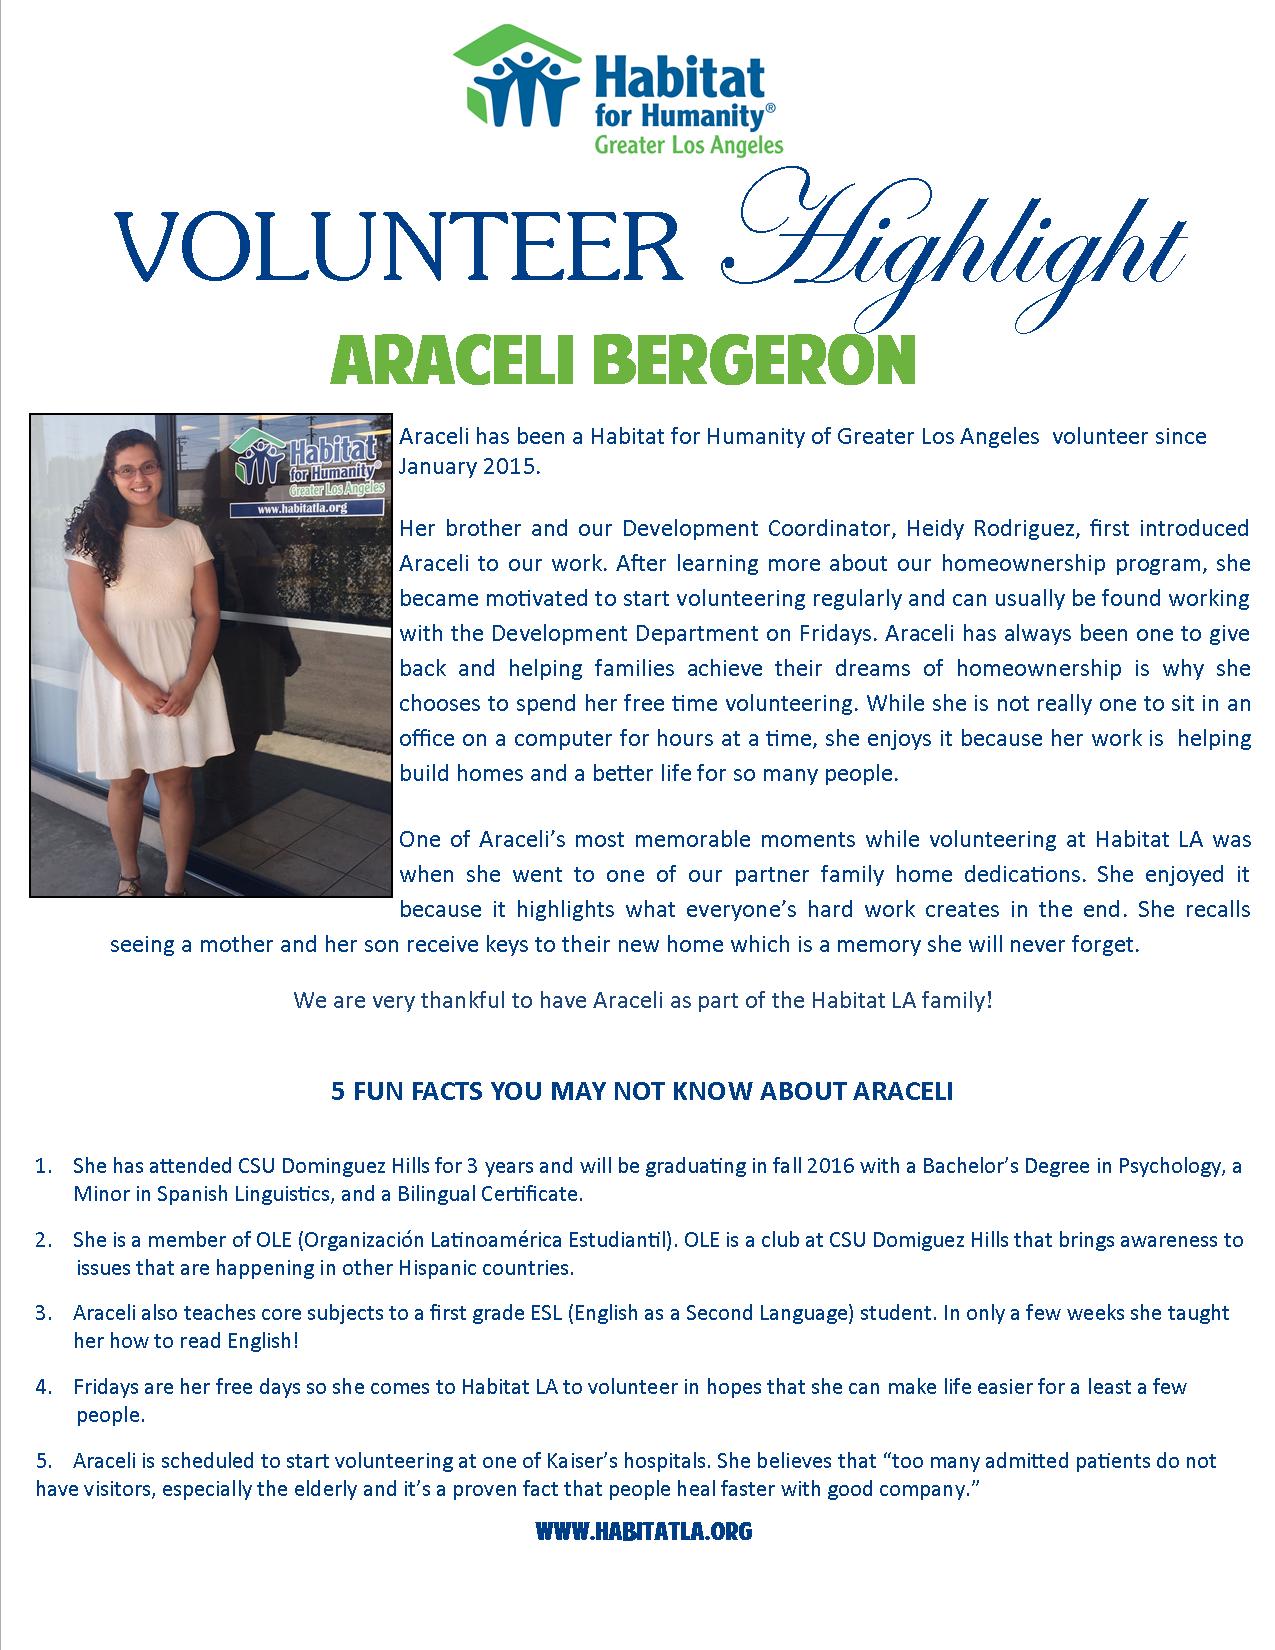 Volunteer Highlight - Araceli Bergeron-Ali edits